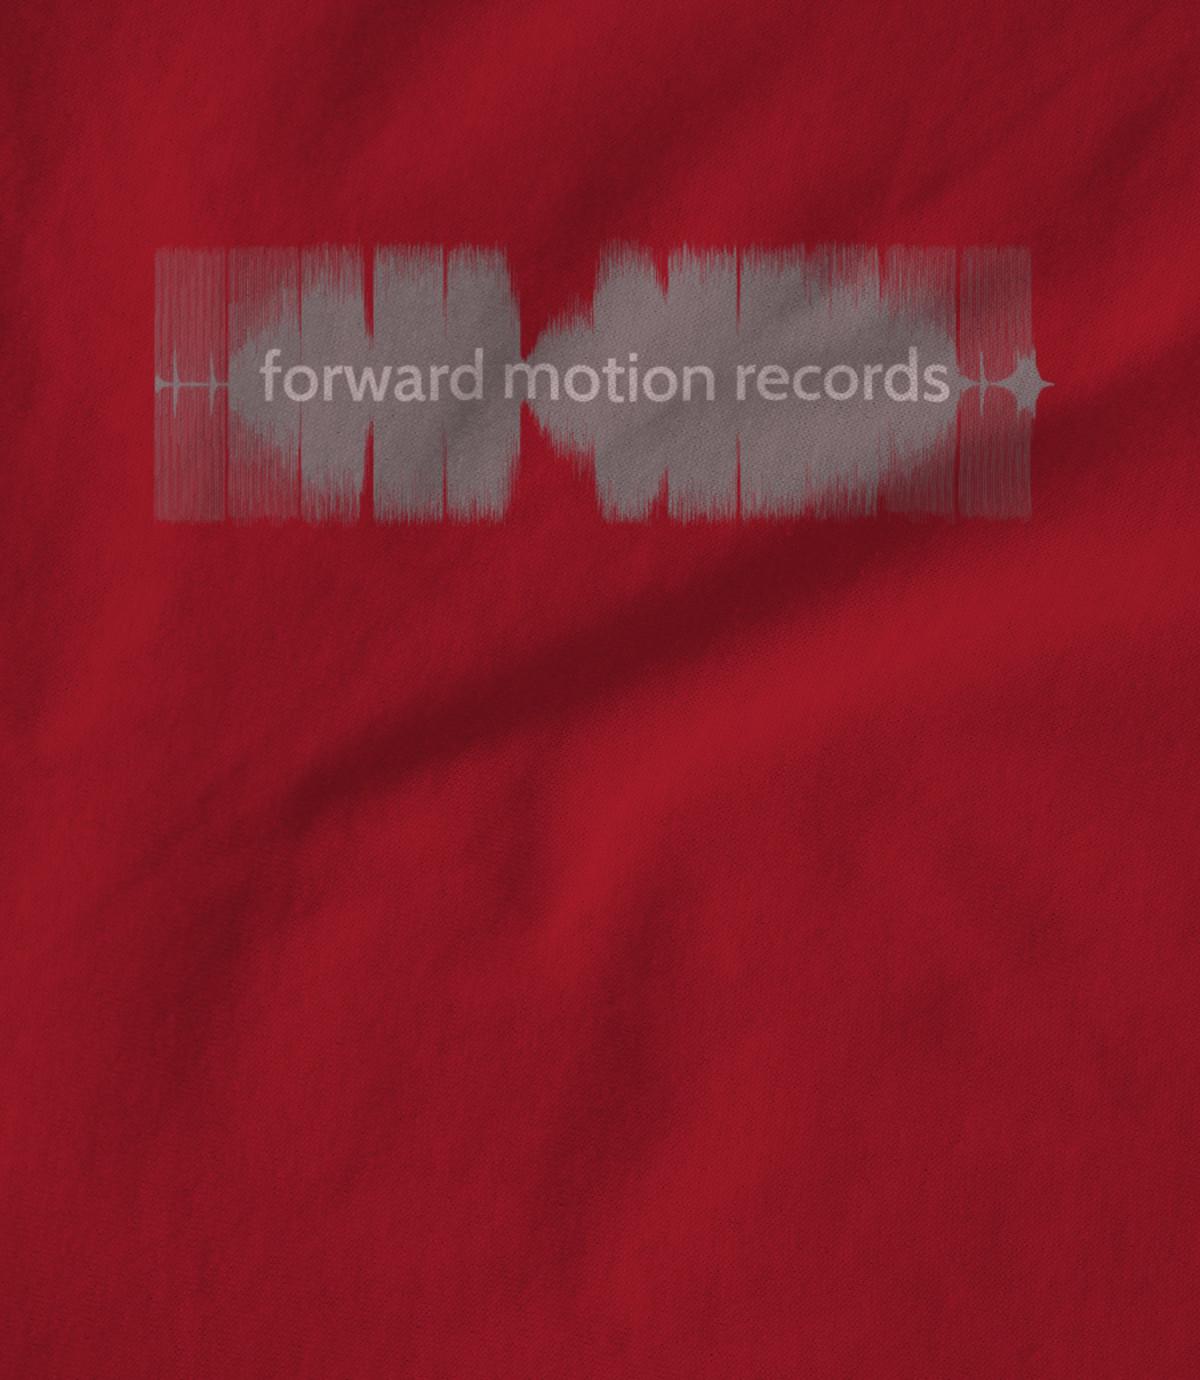 Forward motion records  uk  forward motion records soundwave design 1550325273